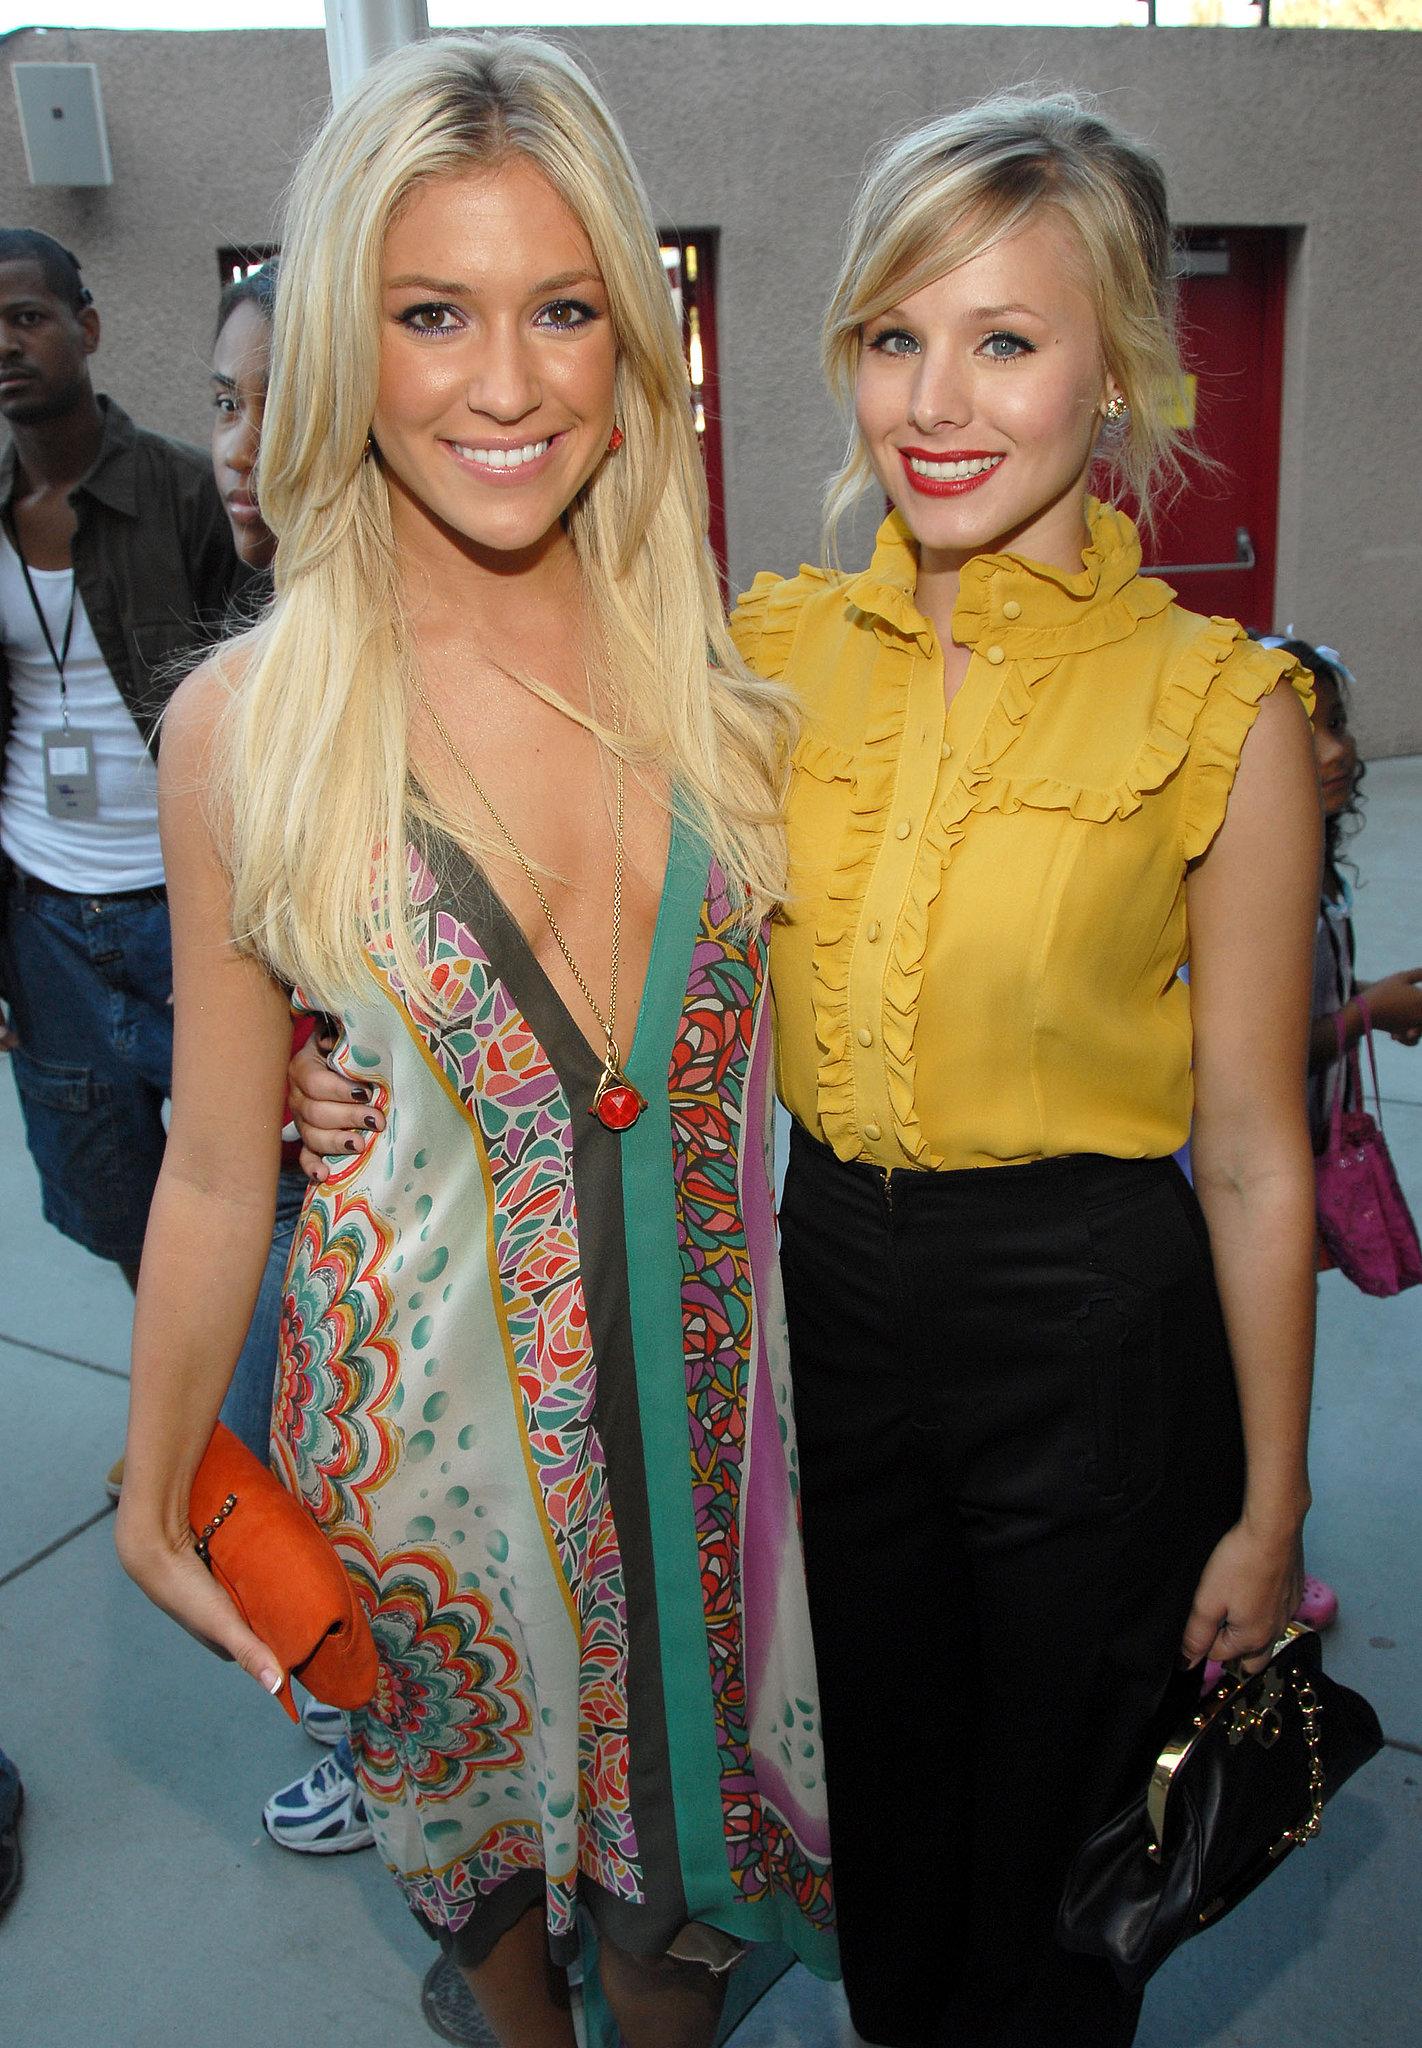 Blond bombshells Kristin Cavallari and Kristen Bell posed together at the awar